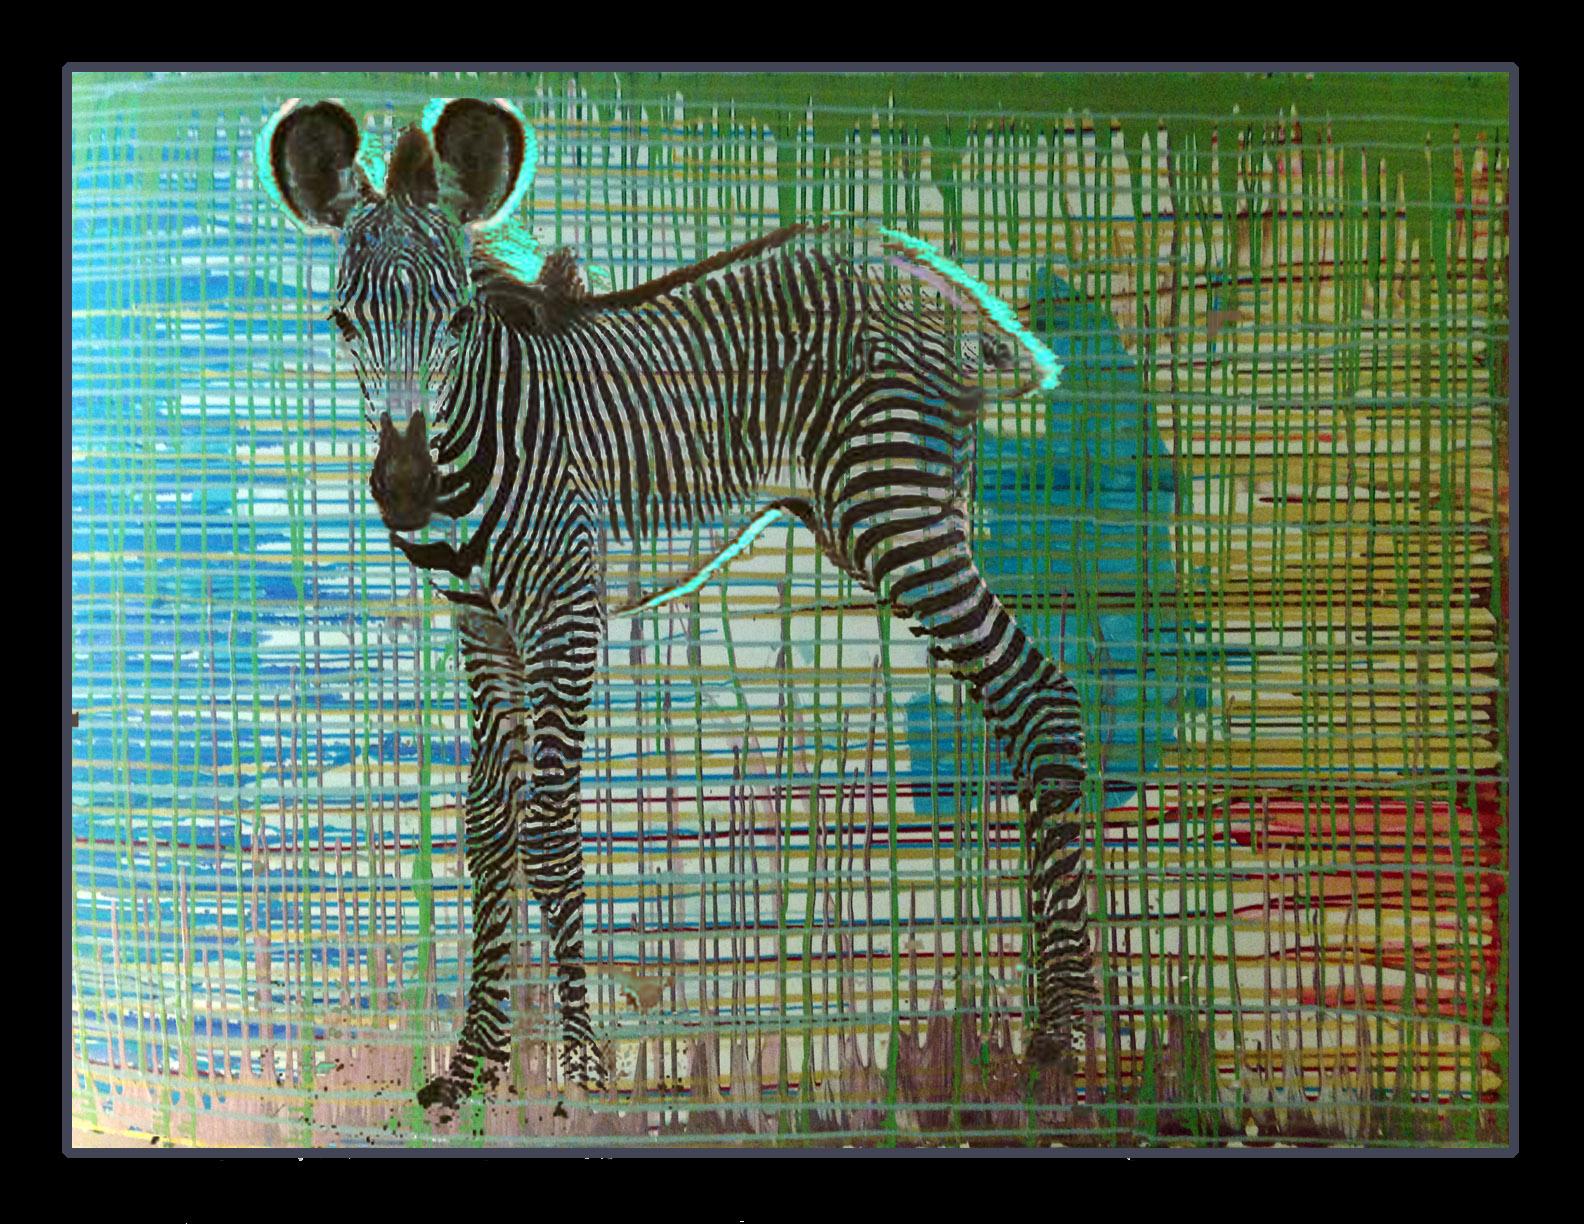 zebra=zipper, 40x60 oil on board, 2015